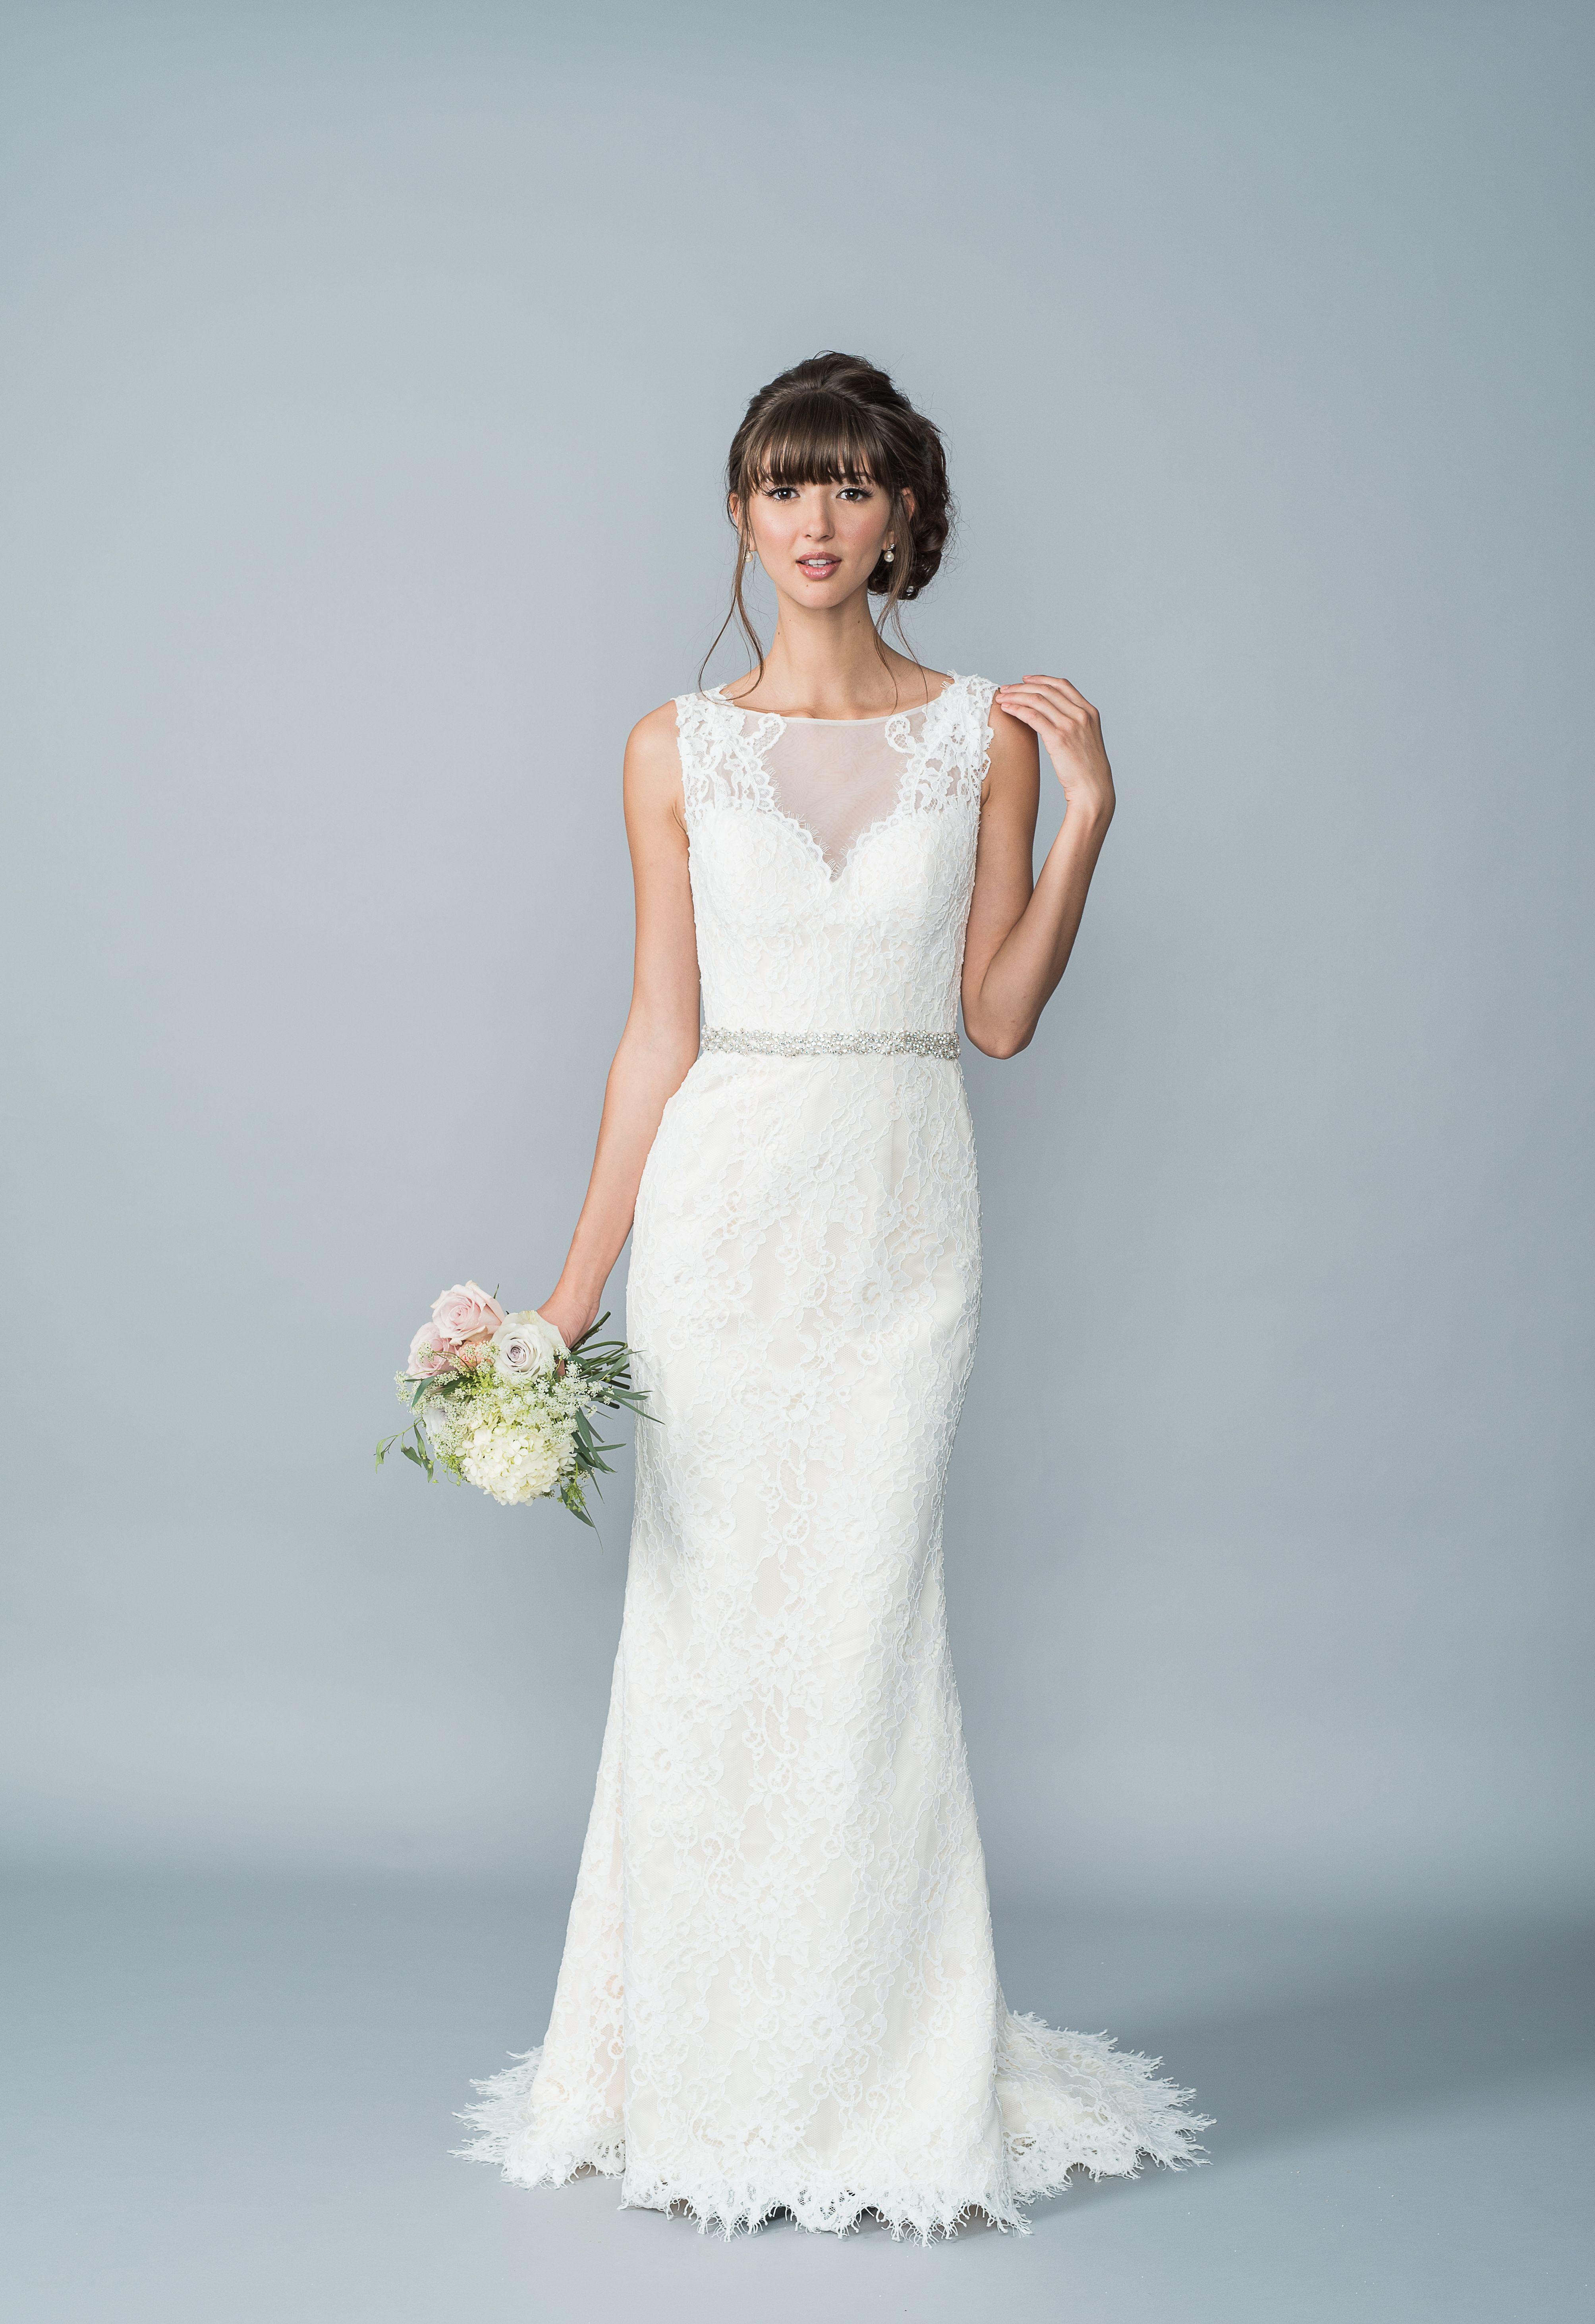 Lis Simon - Hara @ Town and Country Bridal Boutique - St. Louis, MO ...